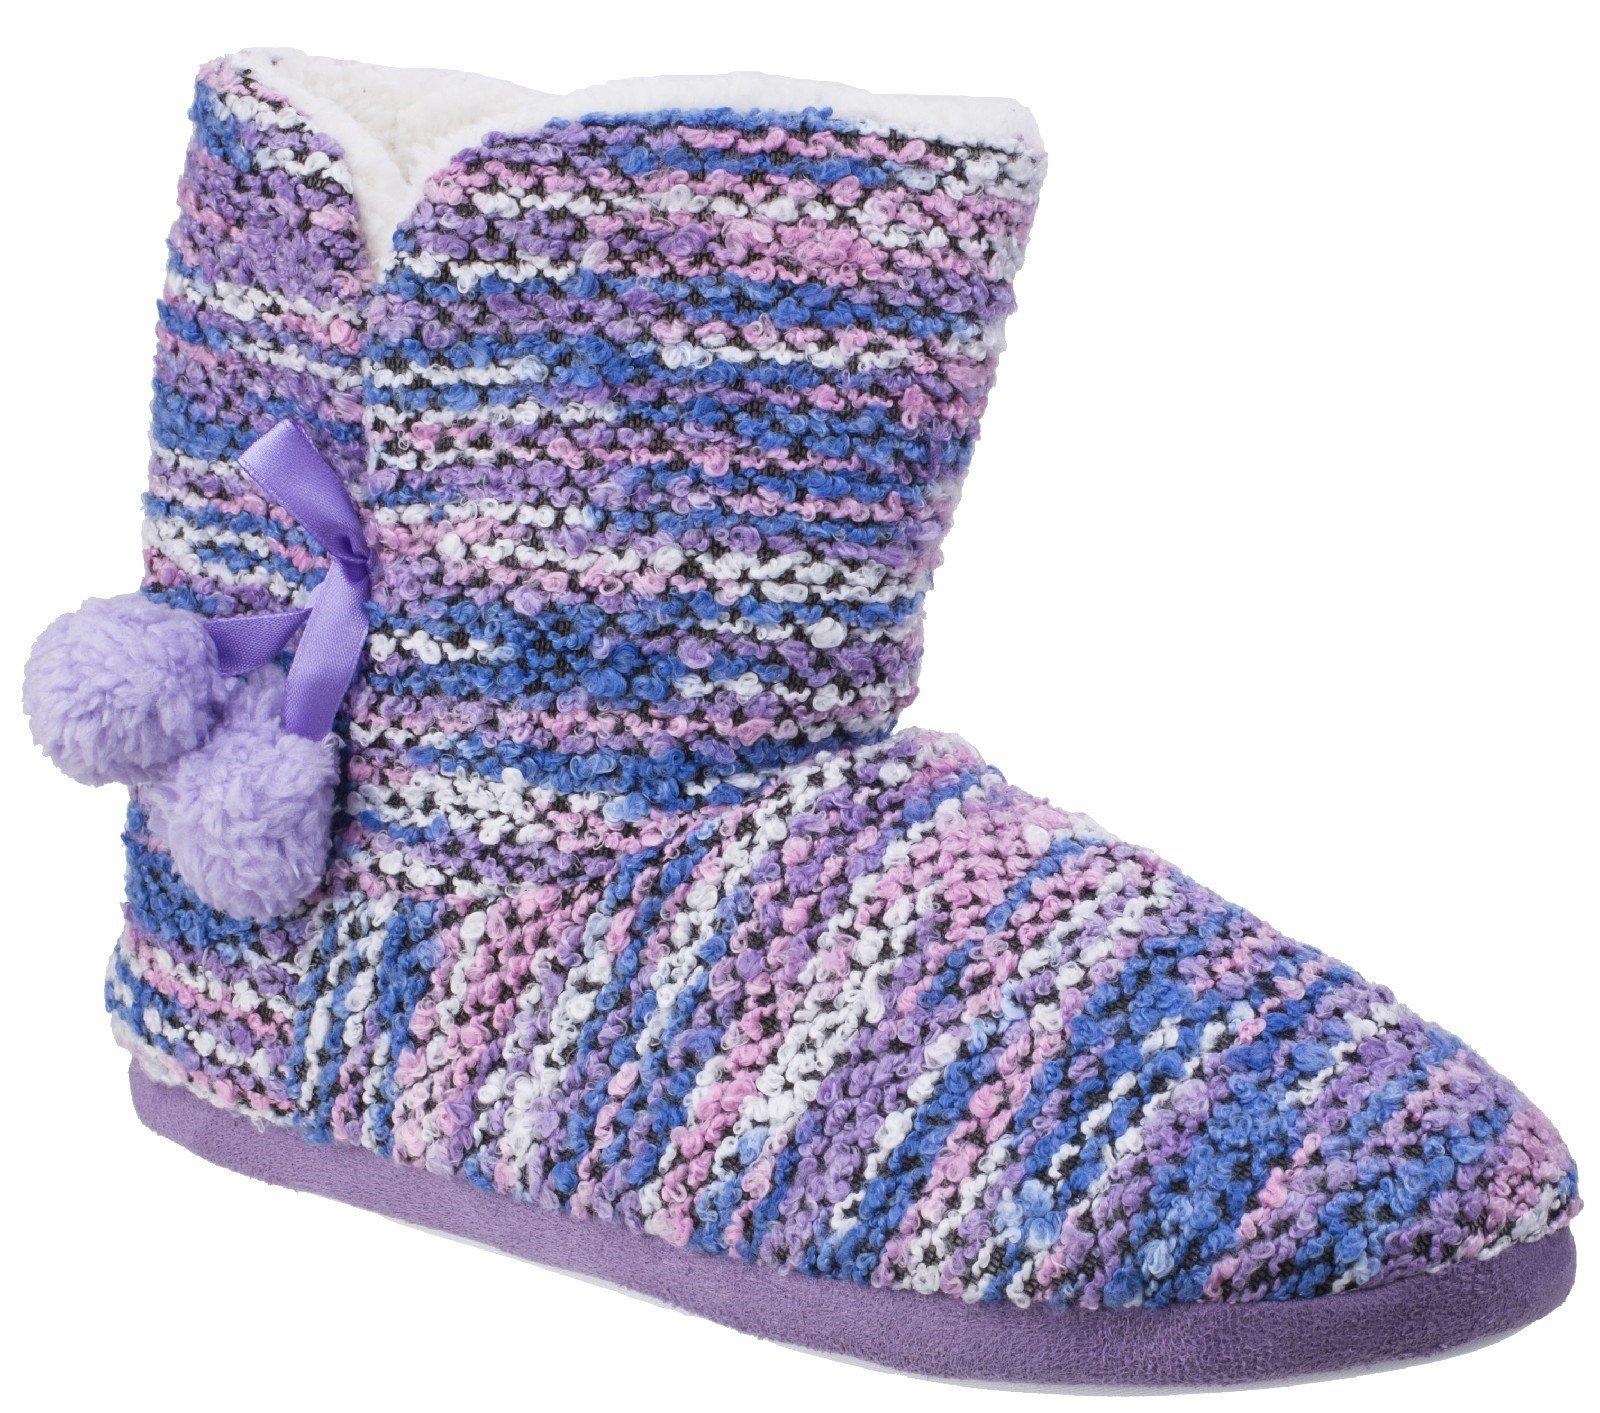 Divaz Women's Vienna Knitted Bootie Slipper Multicolor 25585-42604 - Purple 4